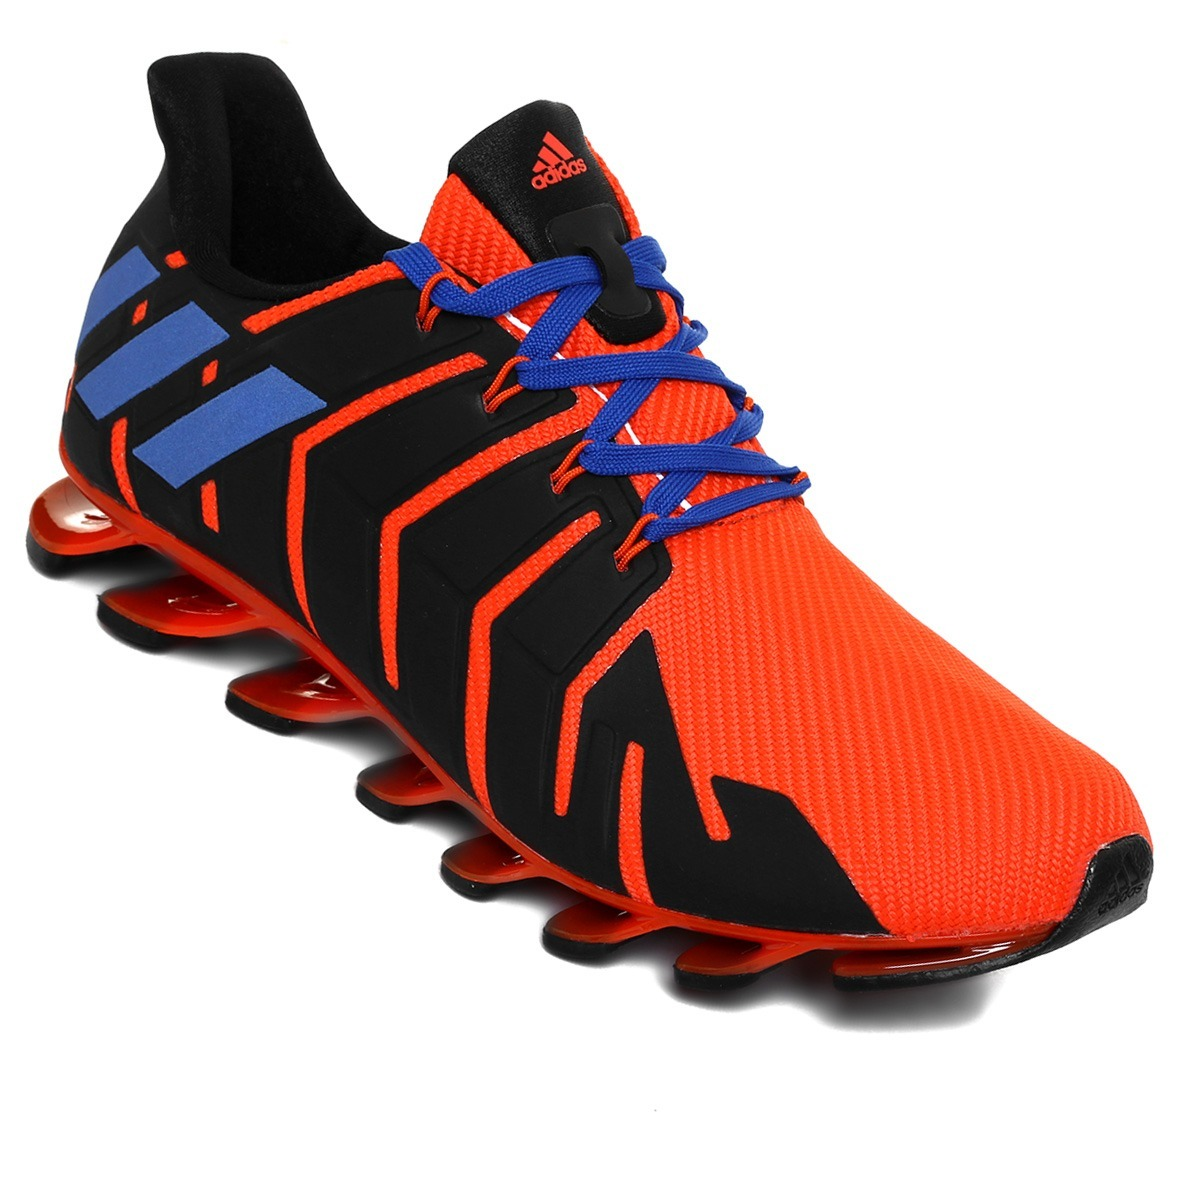 purchase adidas springblade pro naranja a7ea8 eddc0